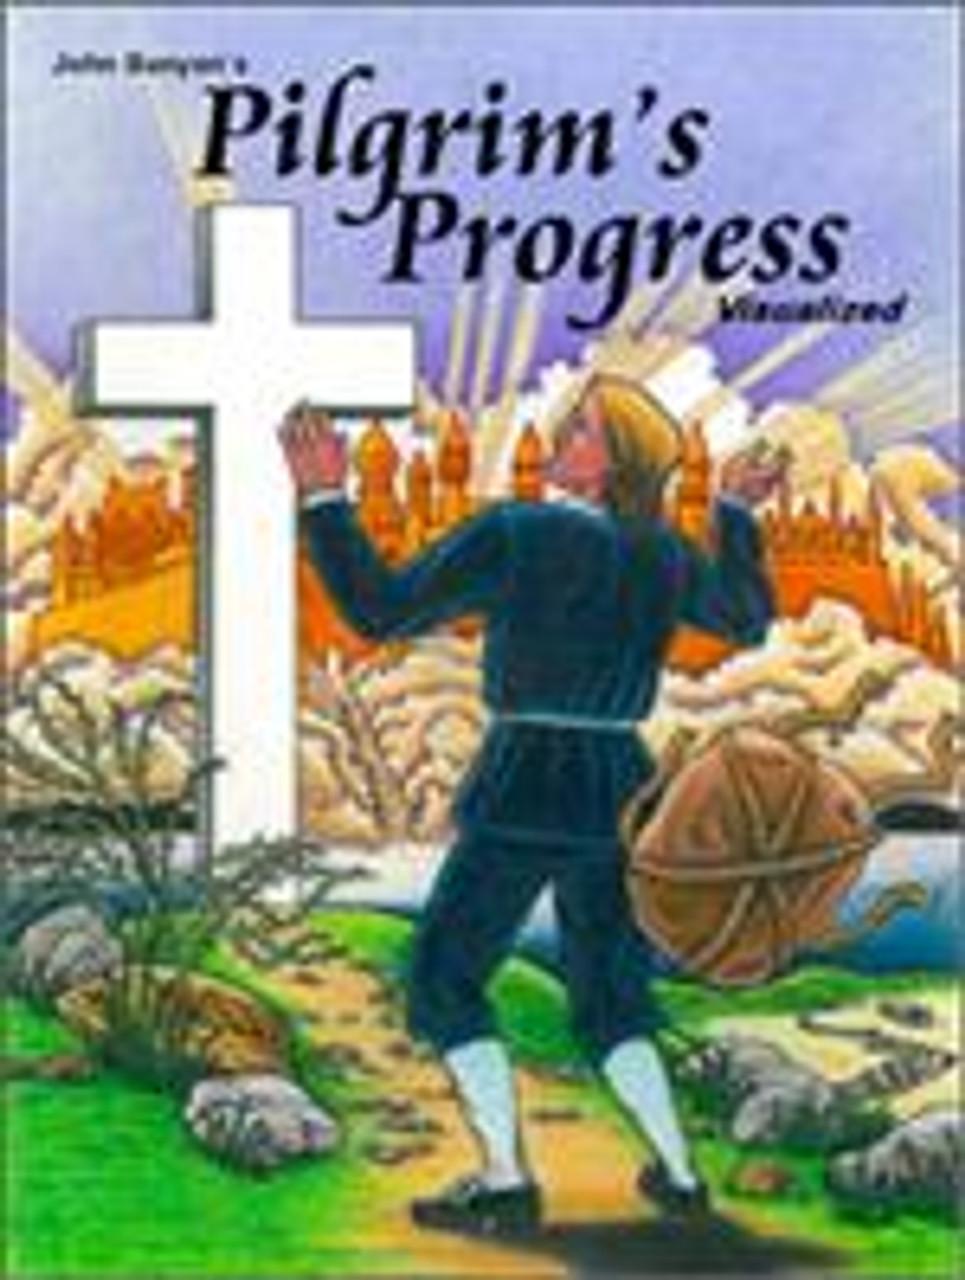 Pilgrim's Progress (visuals only)